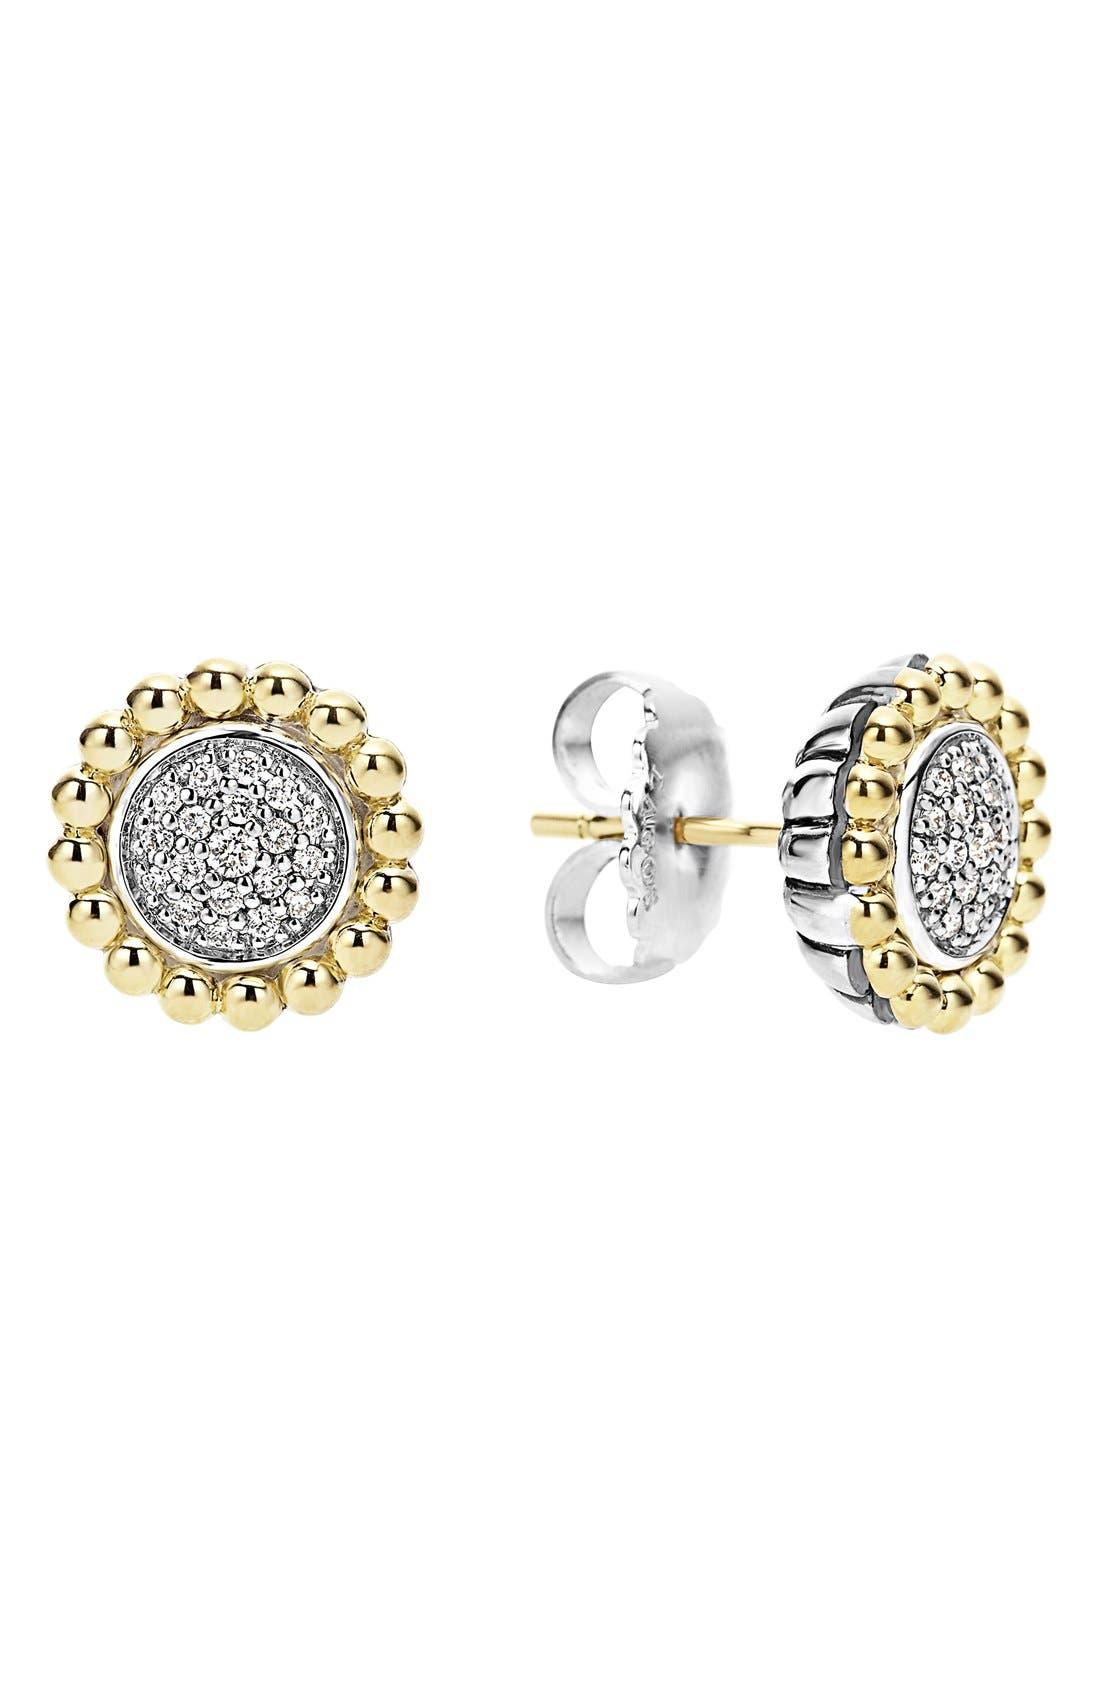 Diamond Caviar Stud Earrings,                             Main thumbnail 1, color,                             SILVER/ GOLD